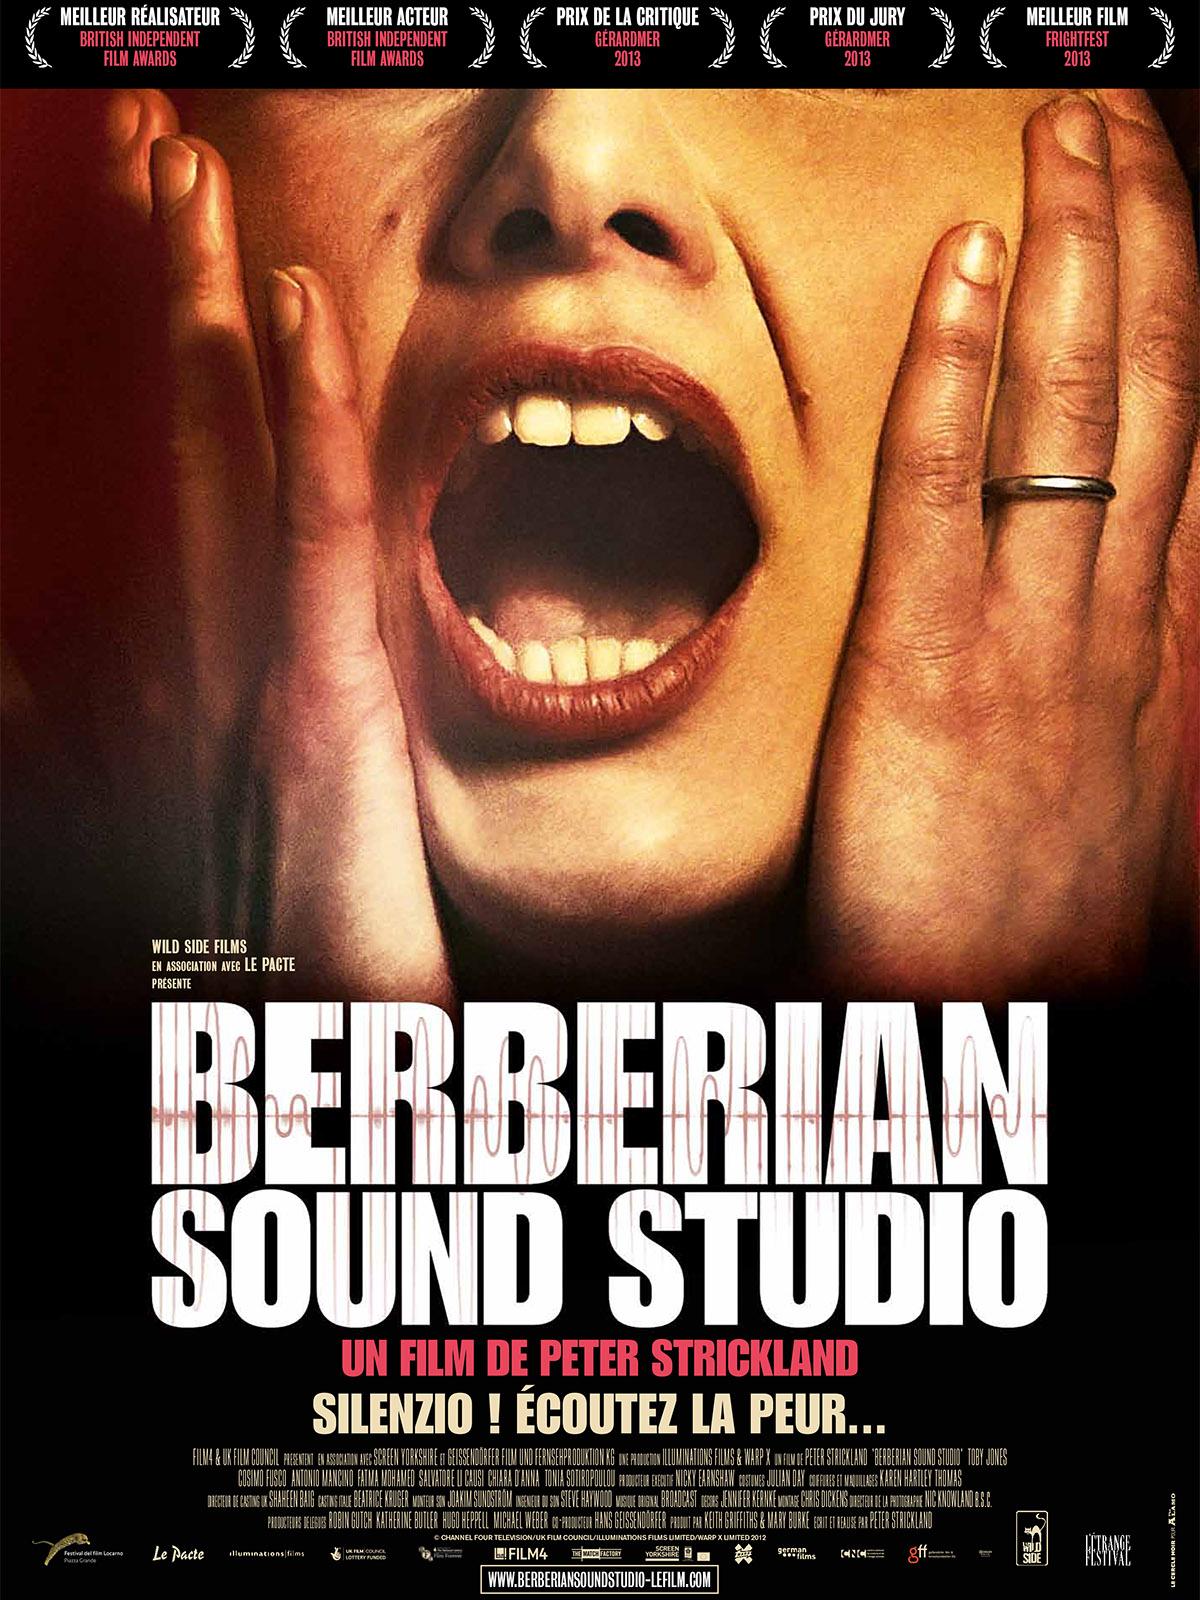 berberian sound studio film 2012 allocin. Black Bedroom Furniture Sets. Home Design Ideas